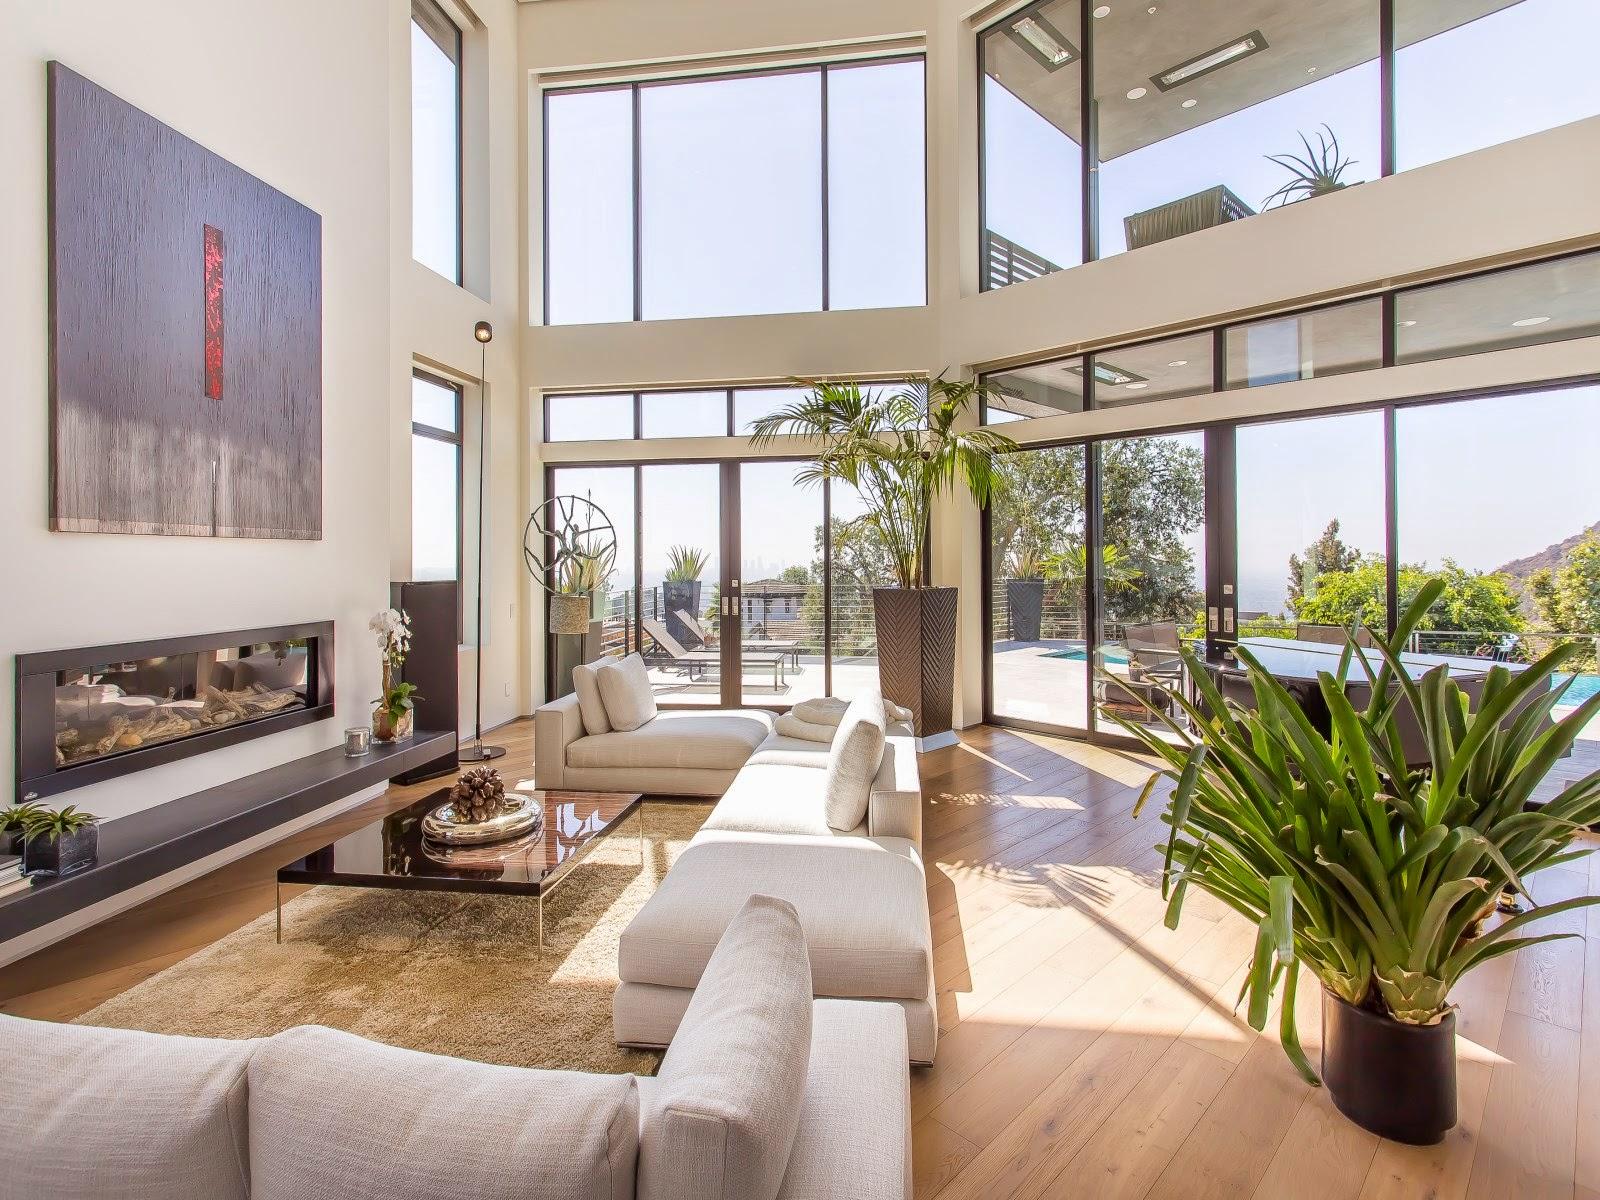 Cococozy 5 dashing 10 million dollar international homes for 10 million dollar homes